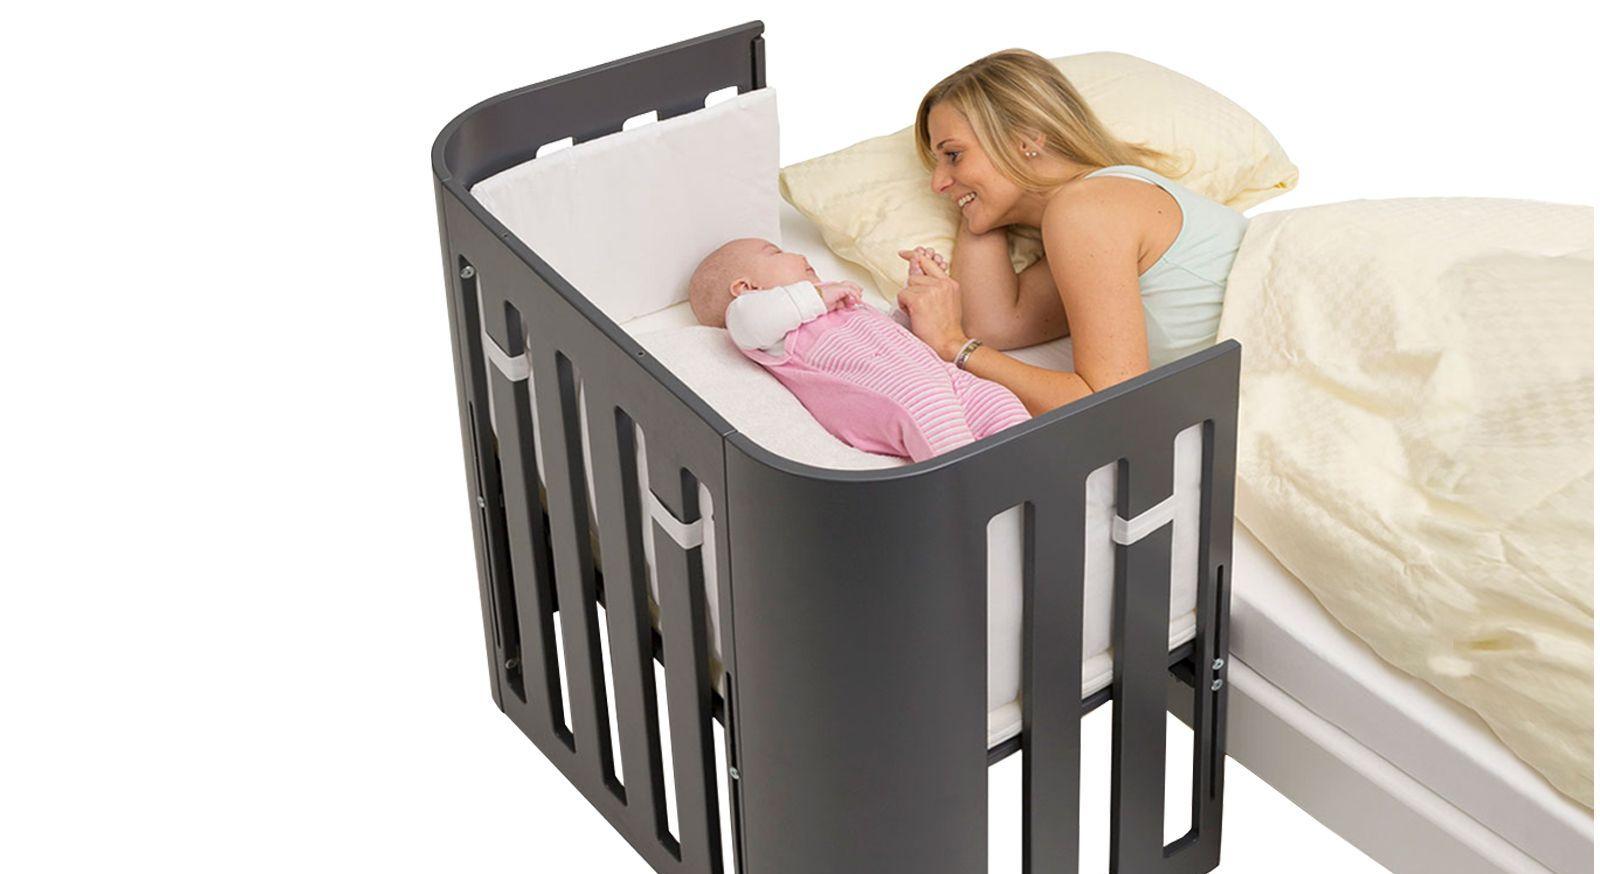 Beistellbett BabyBay Trend in Schiefergrau lackiert